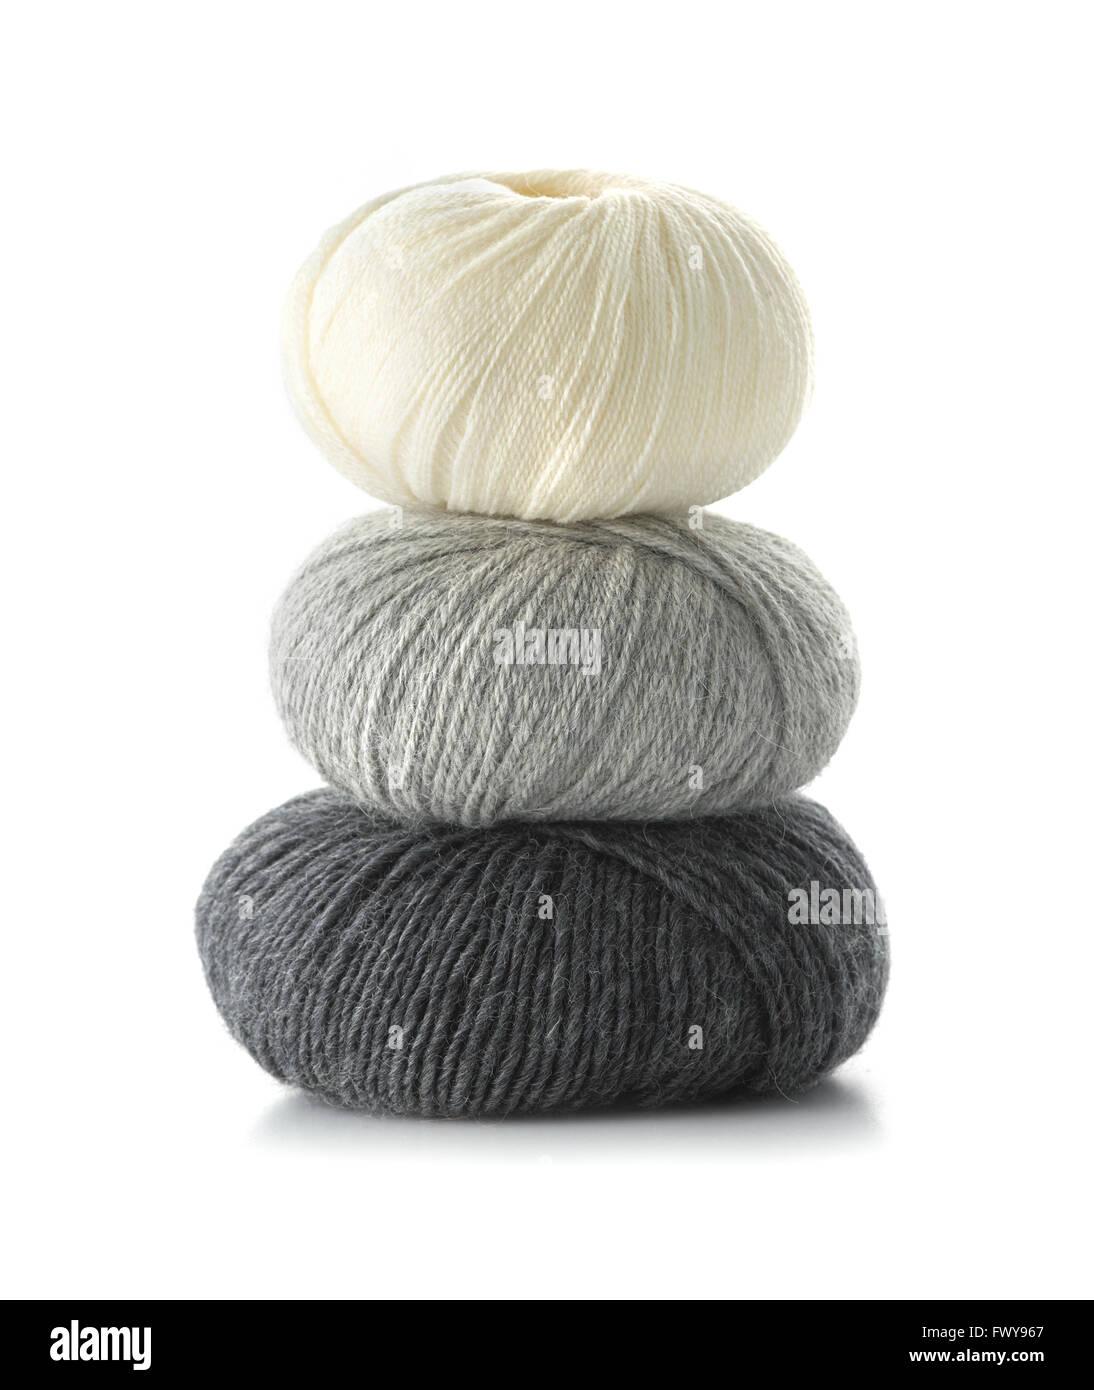 3 balls of wool - Stock Image